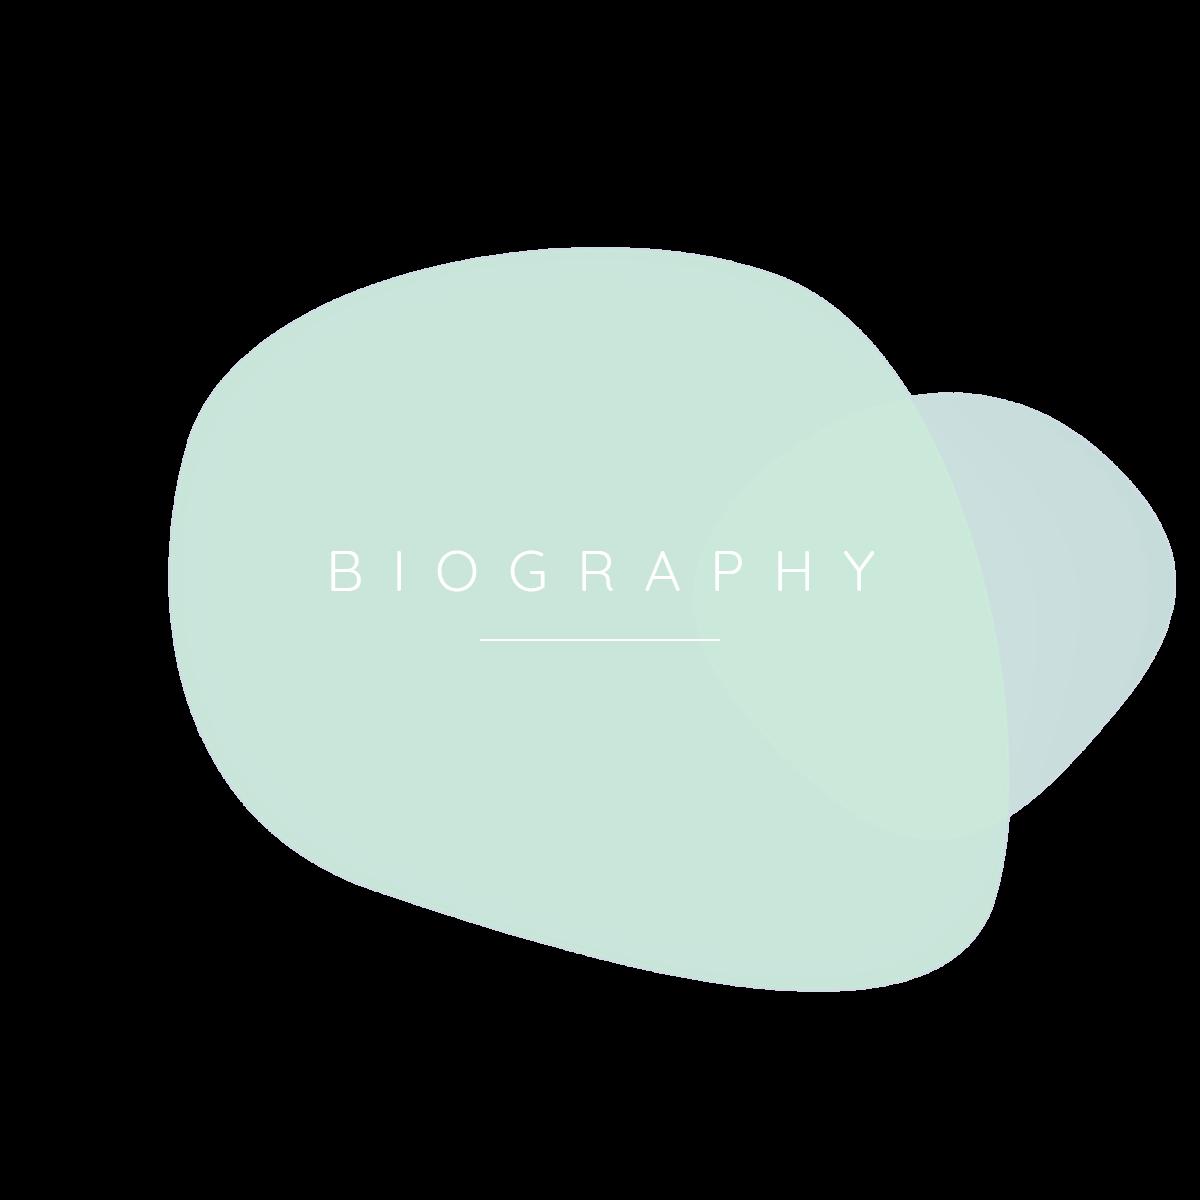 Biography_Header